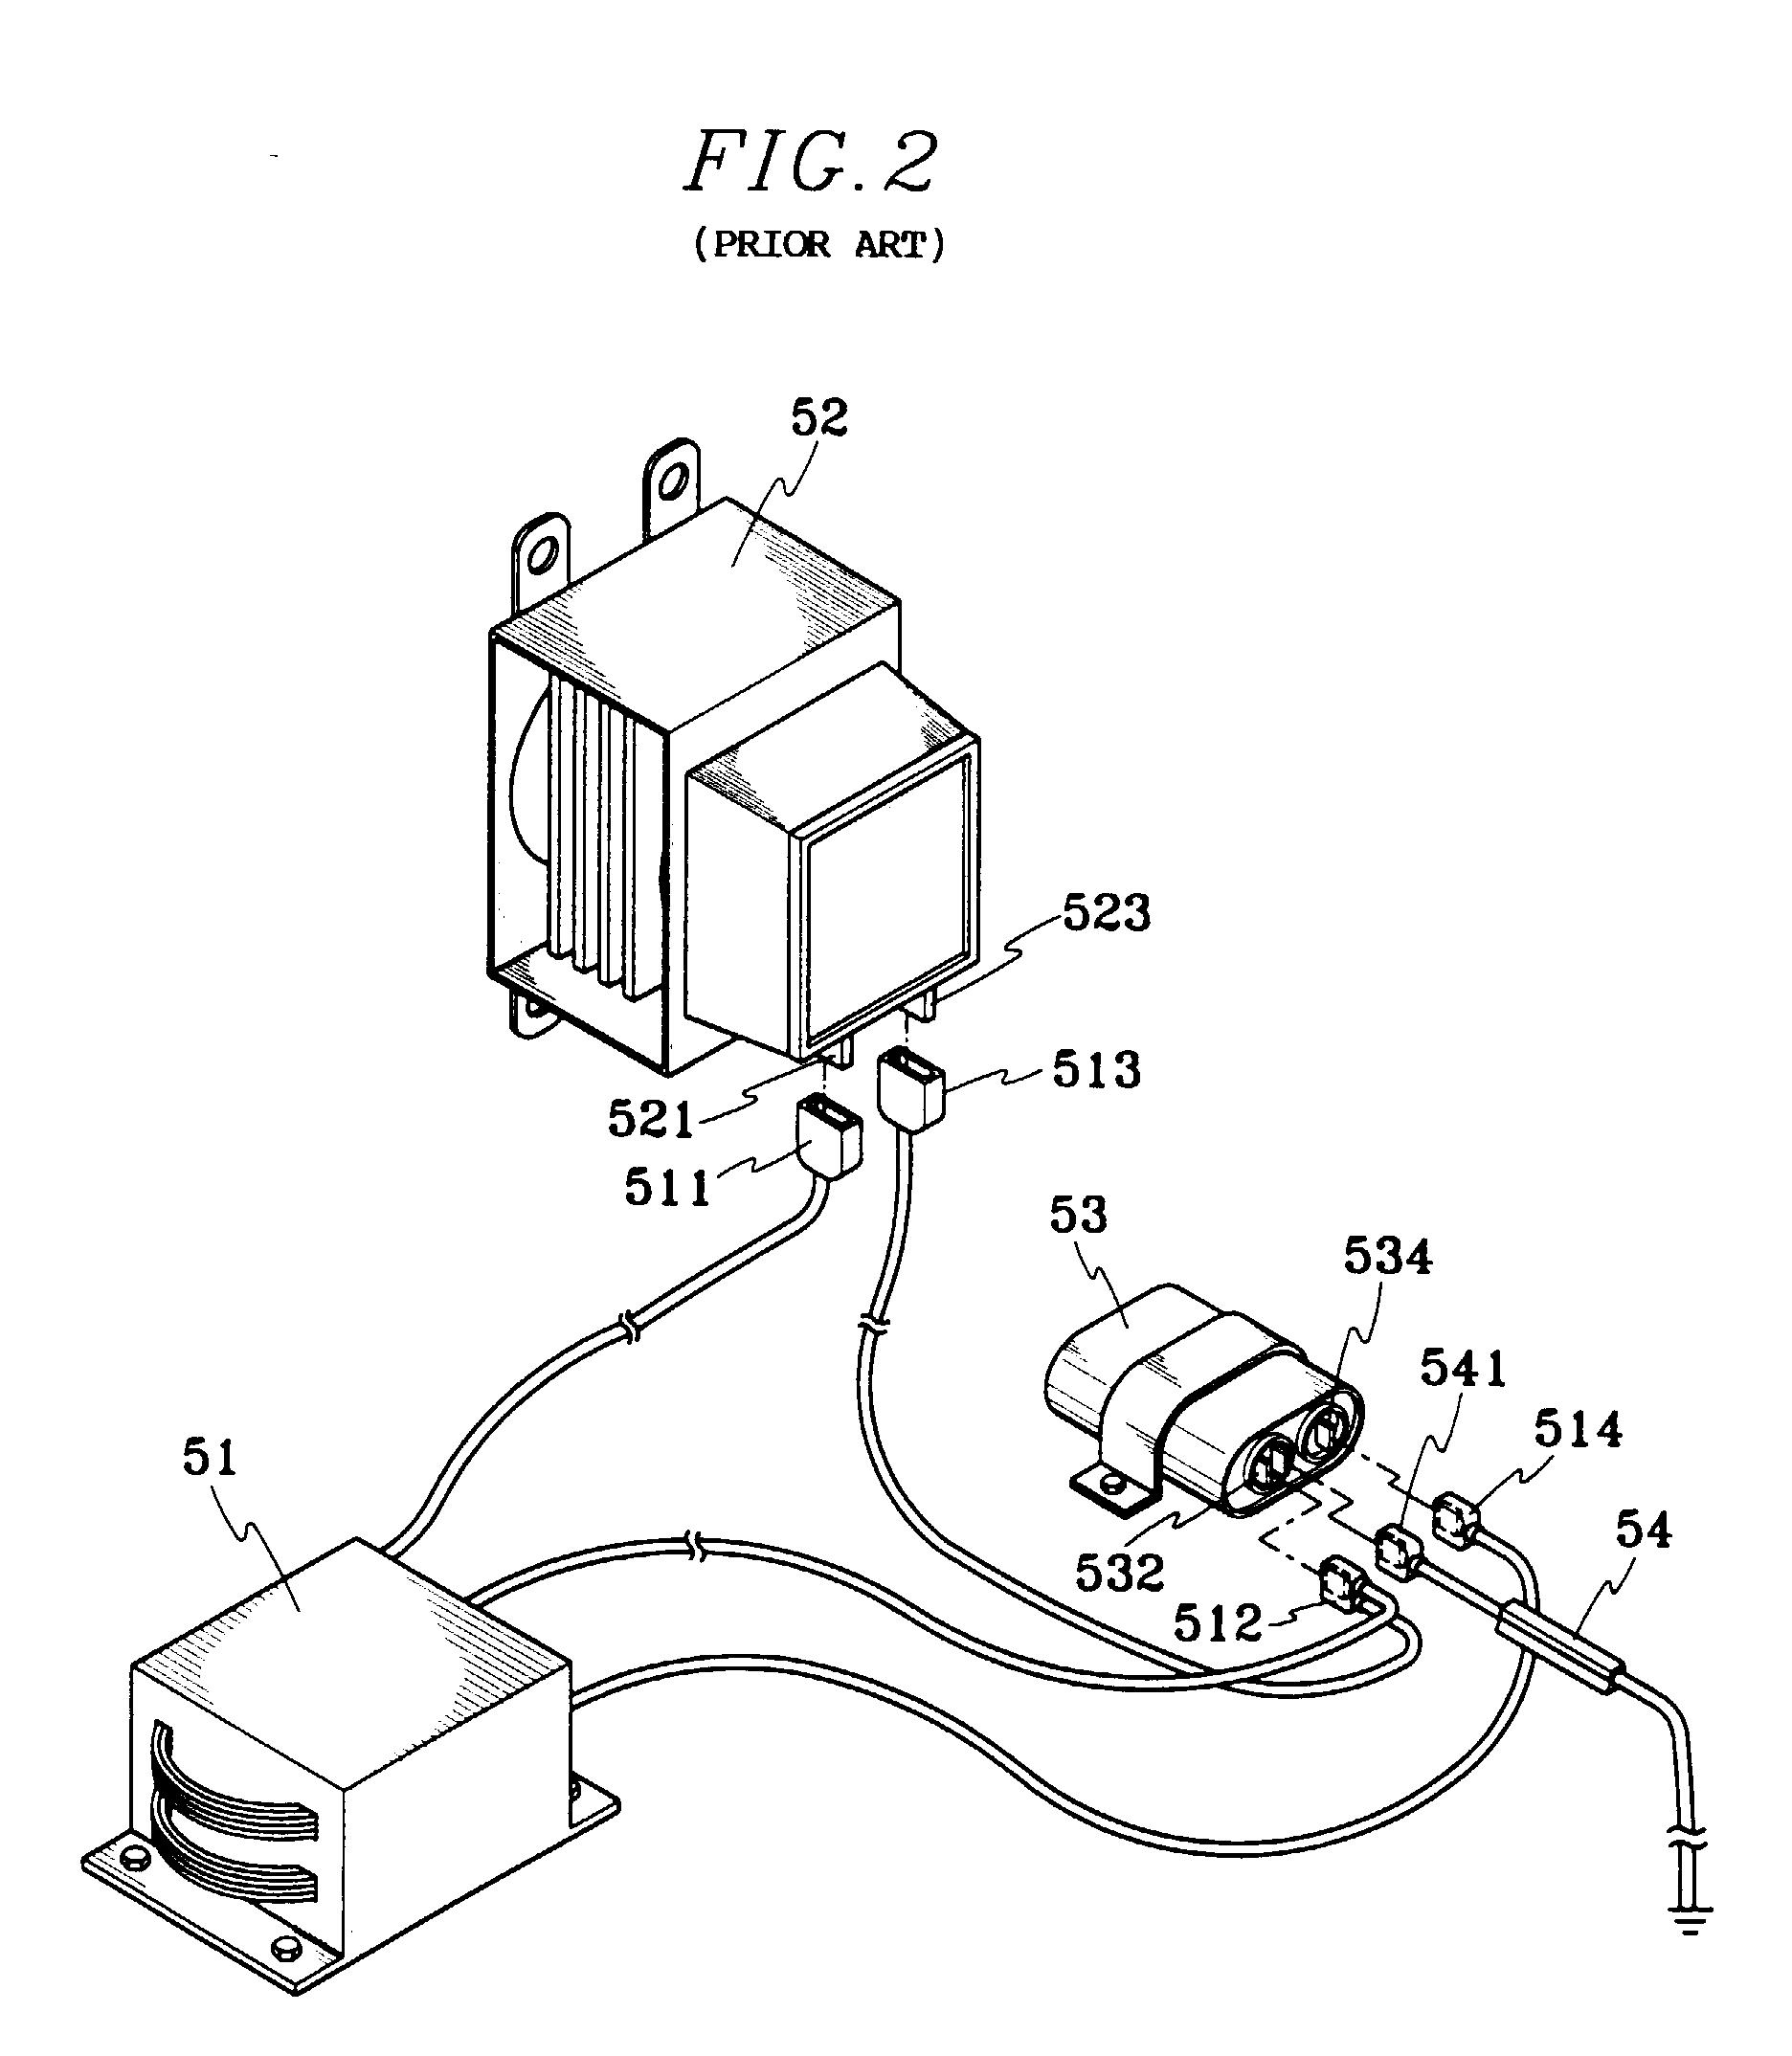 00090001?resize\\=665%2C763 maytag wall oven wiring diagram whirlpool range wiring diagram wall oven wiring diagram at bayanpartner.co